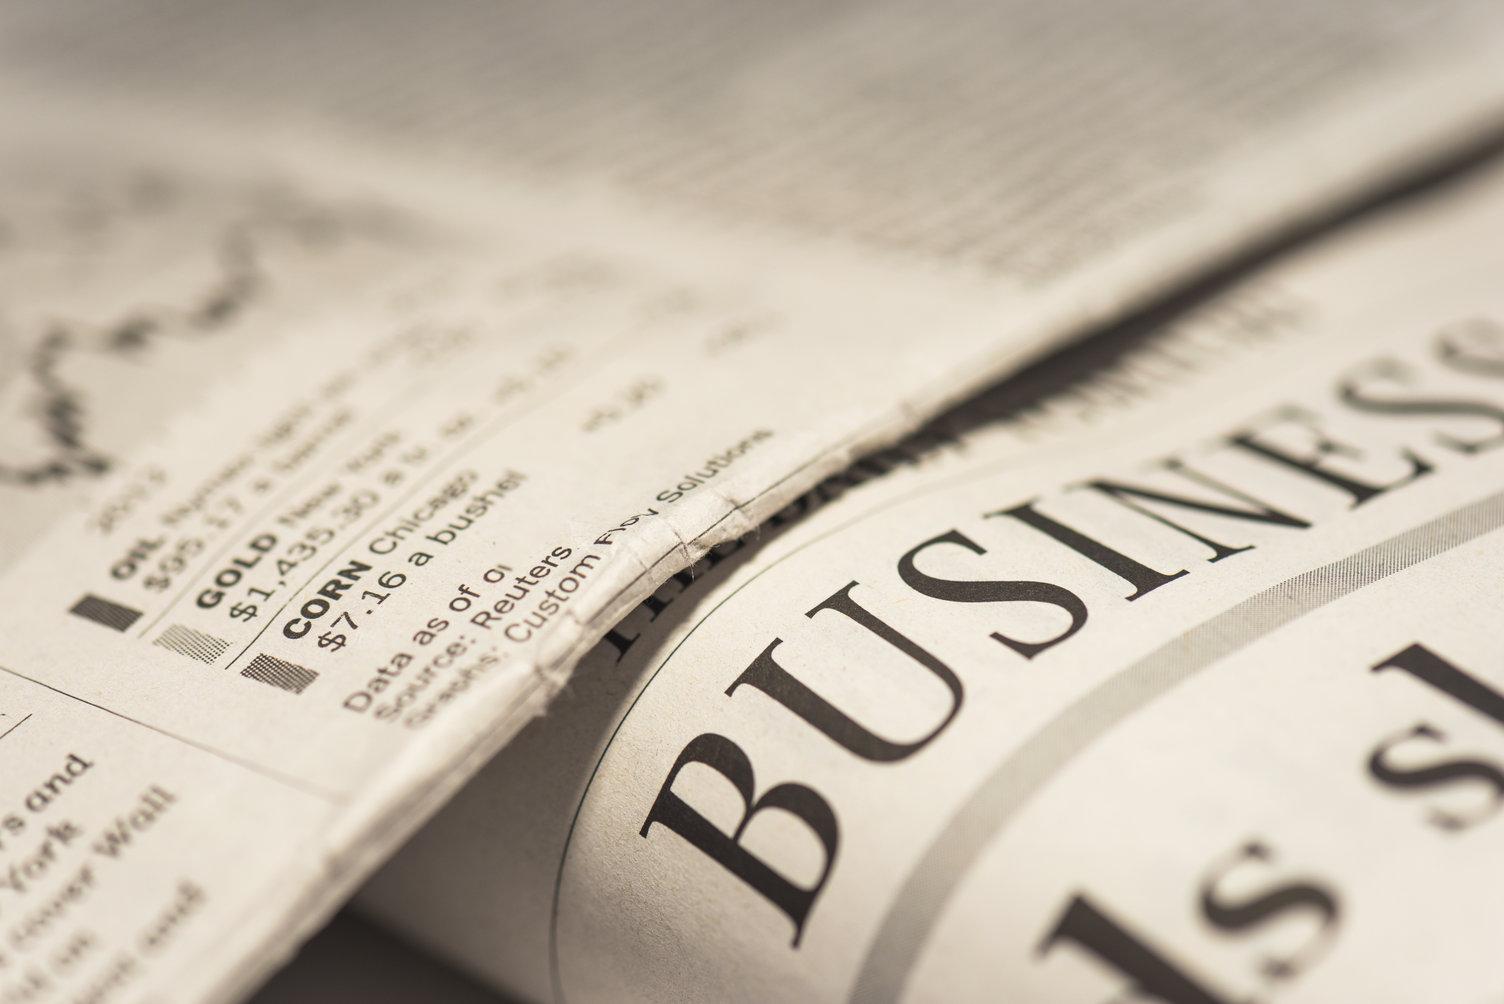 where to buy ibd newspaper